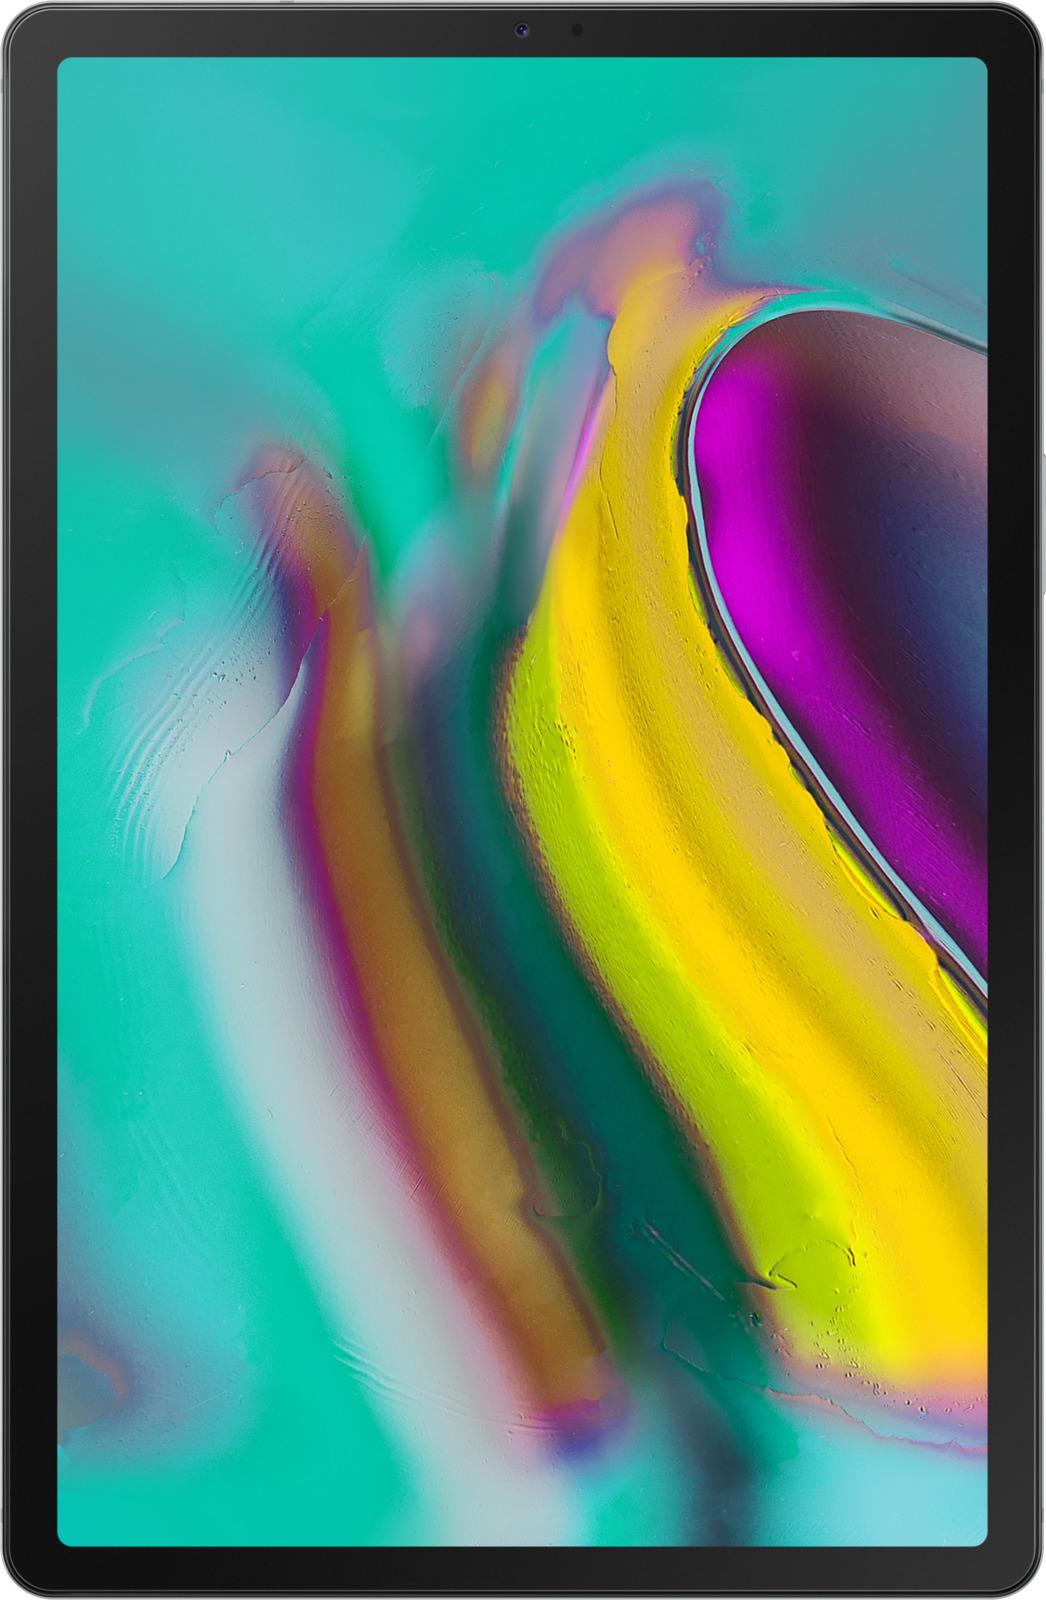 10.5 Планшет Samsung Galaxy Tab S5e Wi-Fi + LTE 64 GB, серебристый